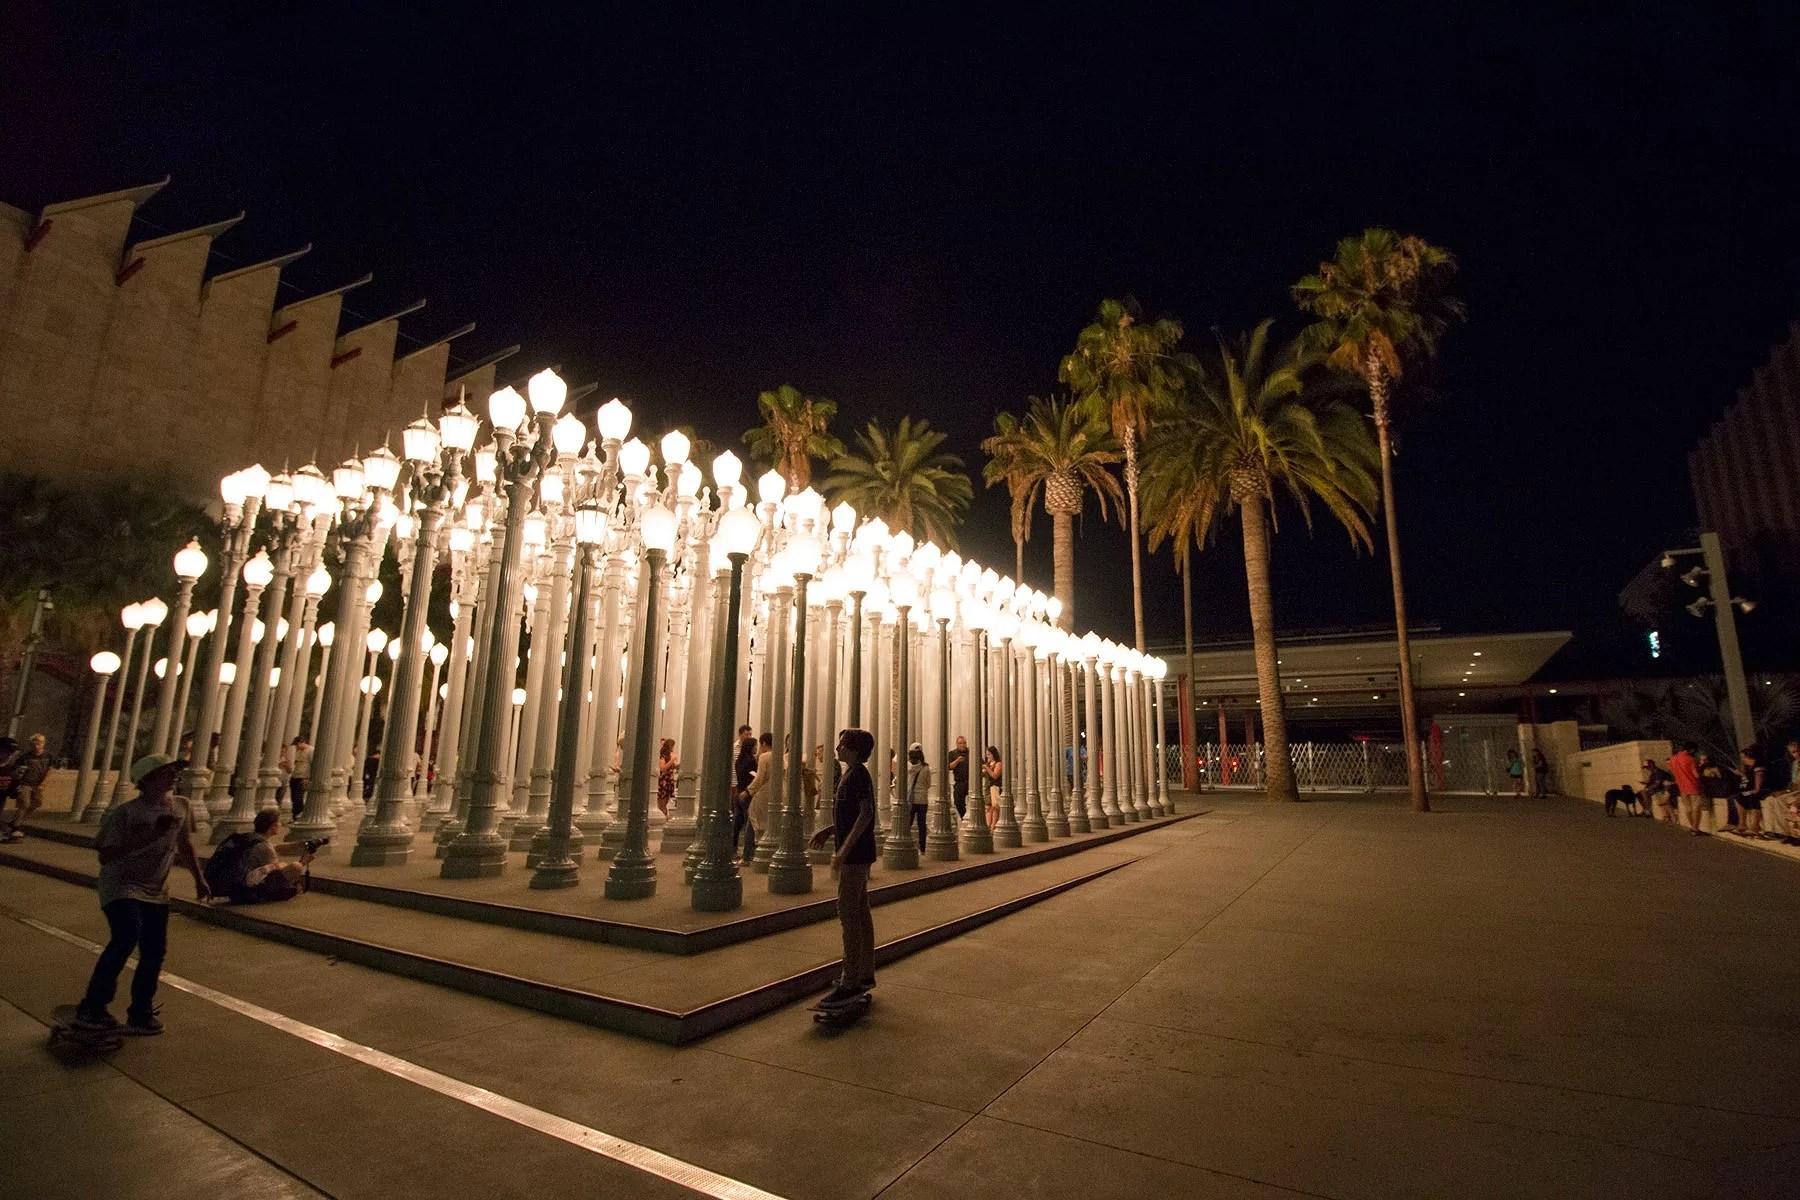 Los Angeles - Urban Light